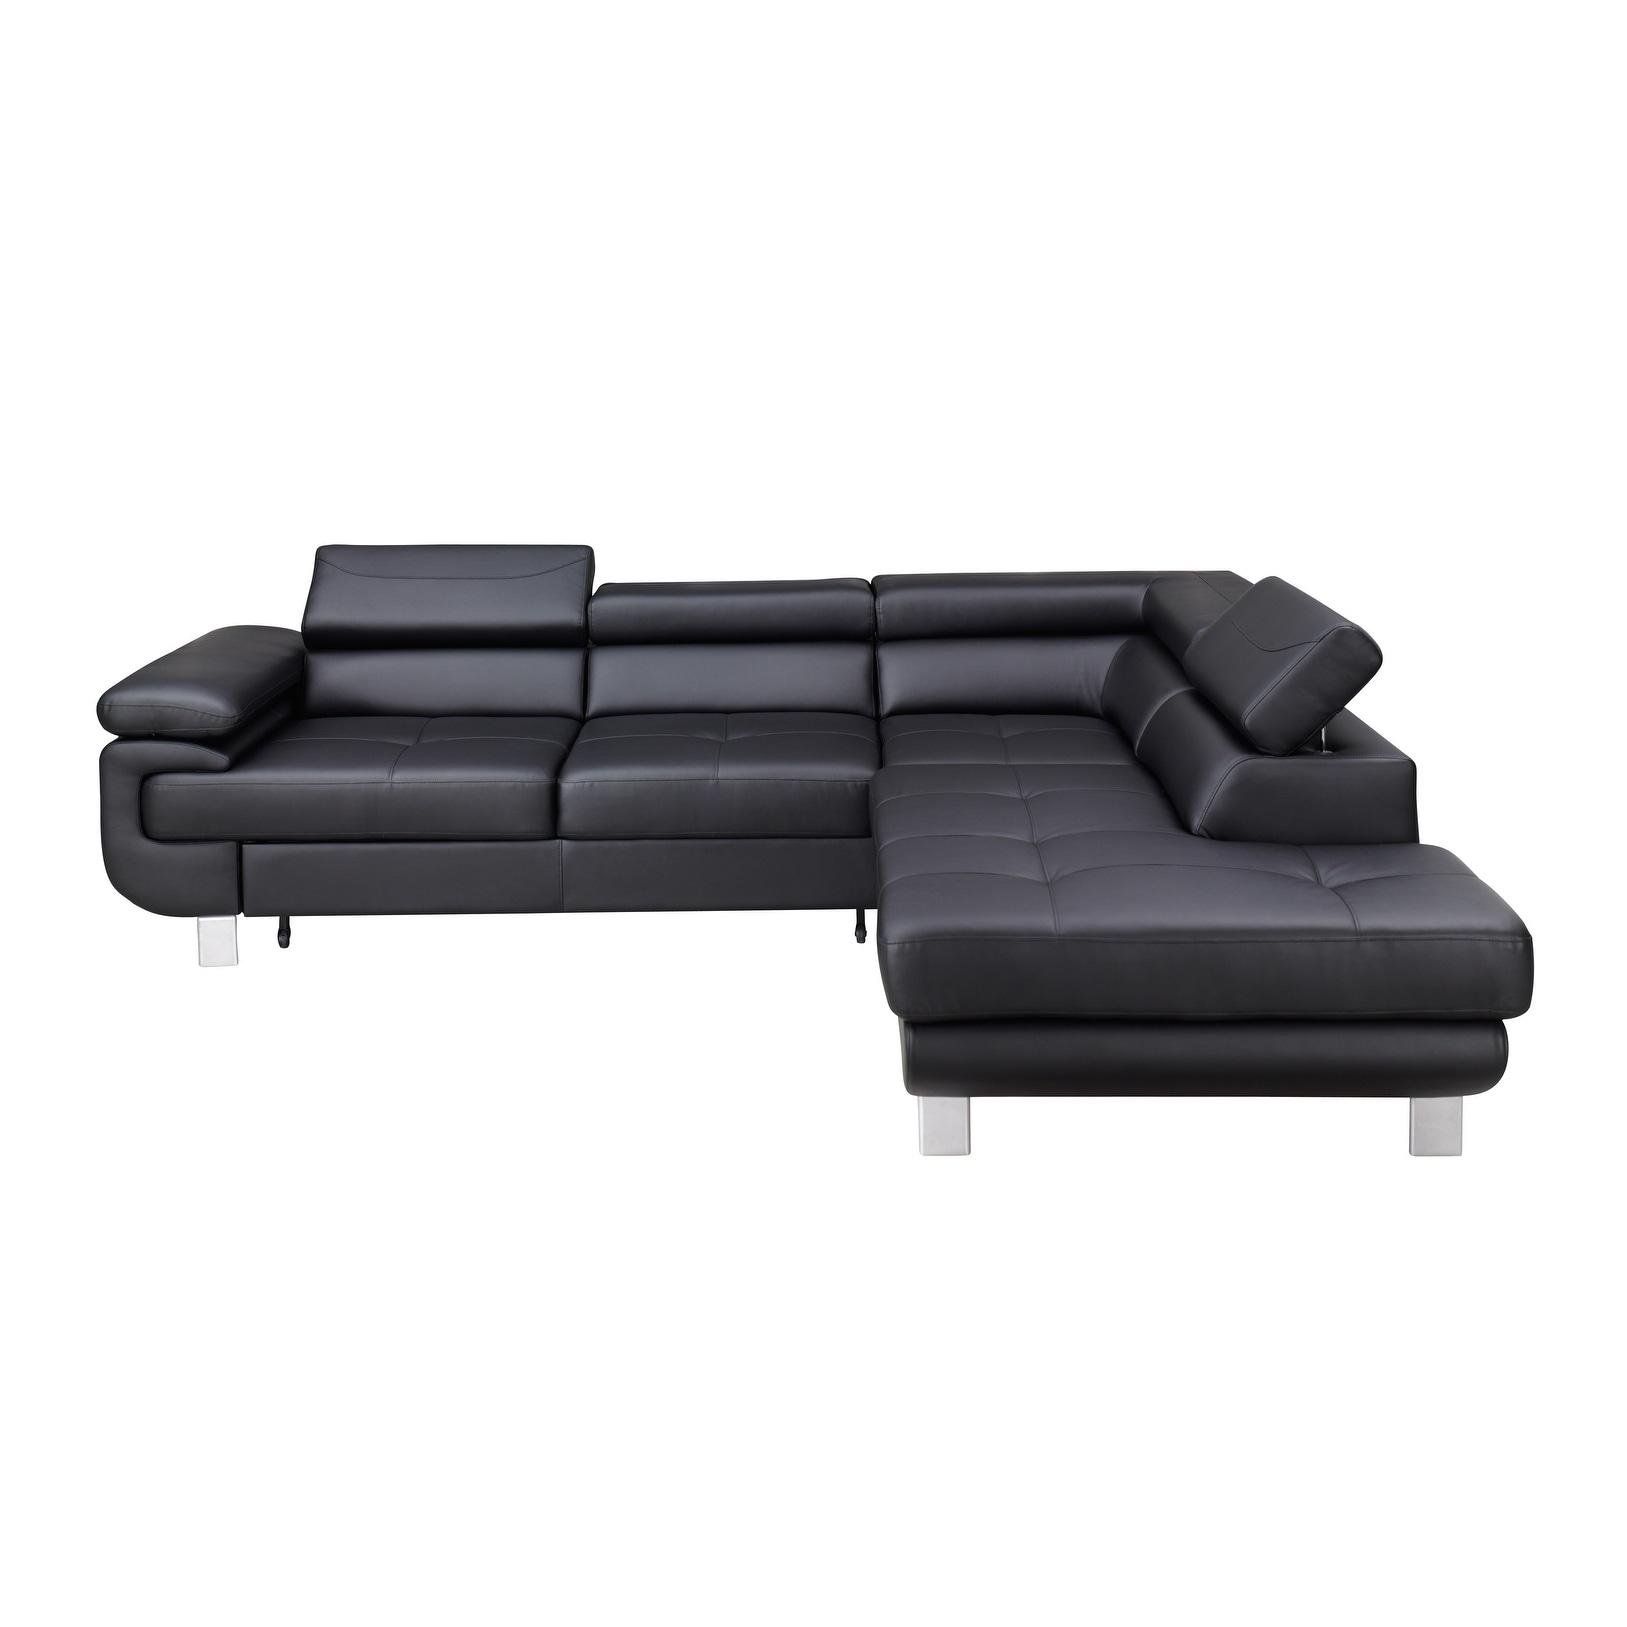 Lotos Sectional Sleeper Sofa Right Corner